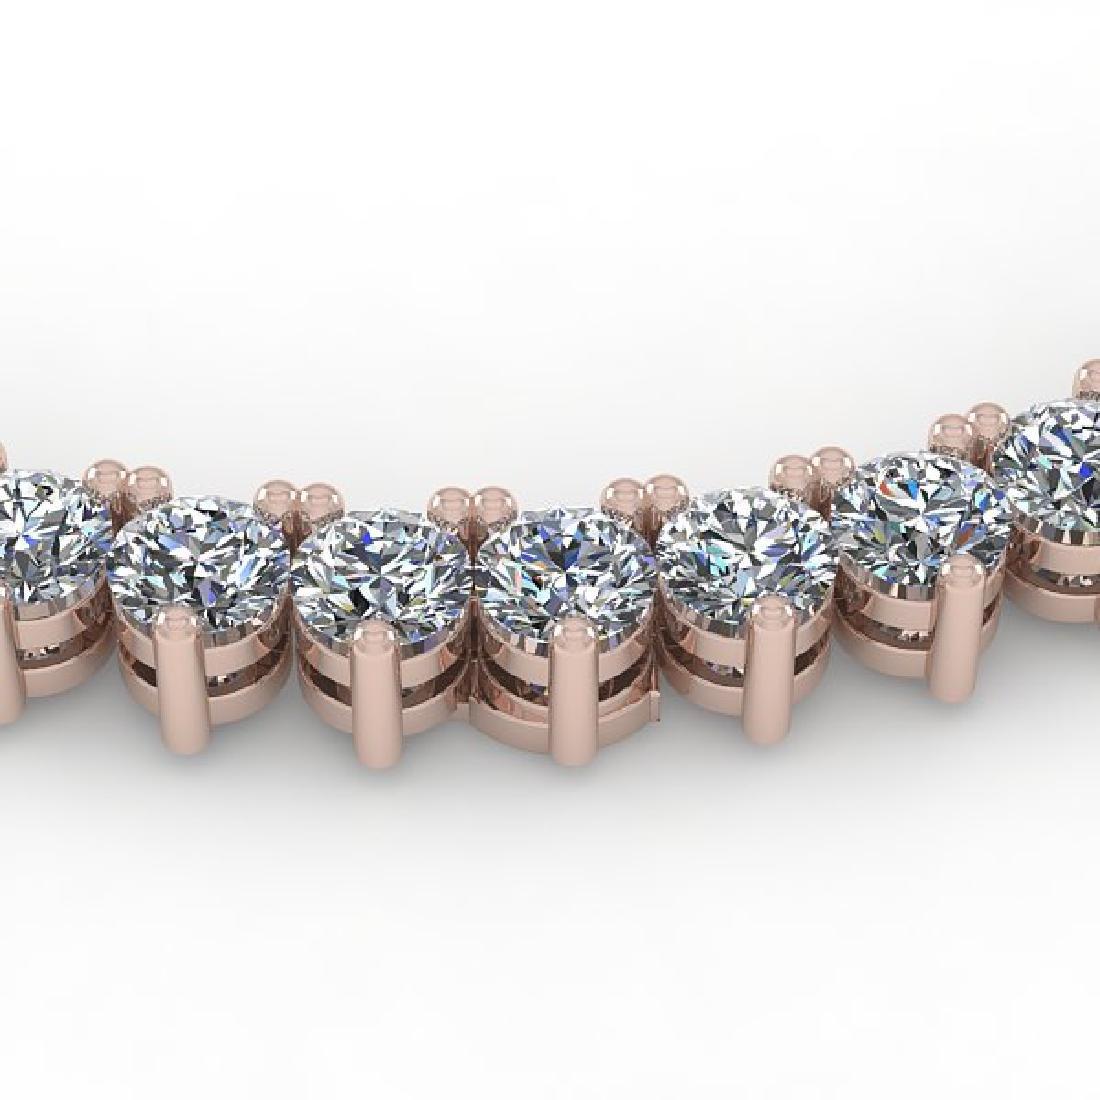 20 CTW Solitaire VS/SI Diamond Necklace 18K Rose Gold